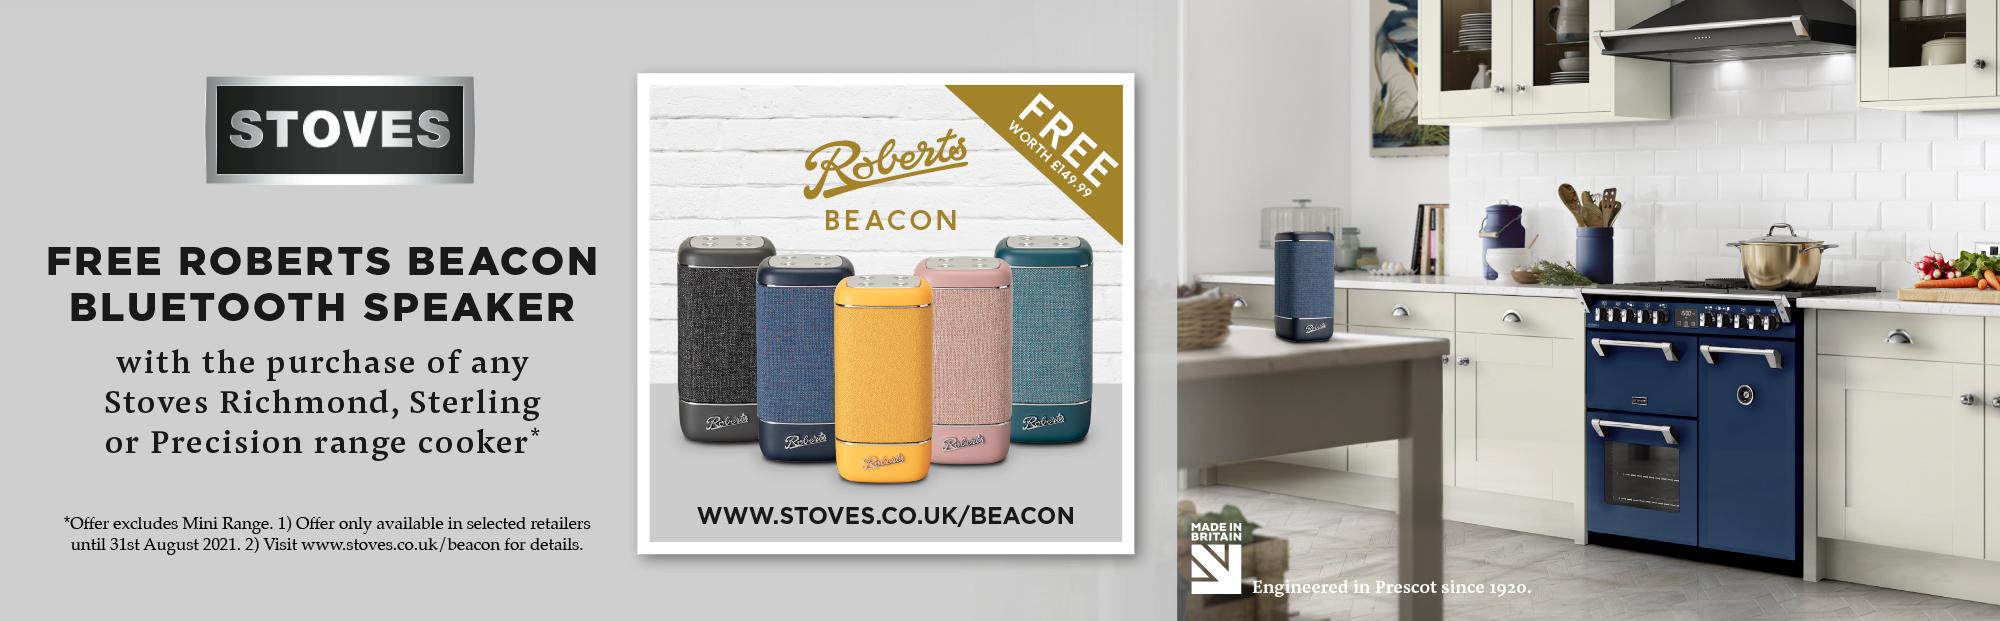 Stoves Free Roberts Beacon Bluetooth Speaker